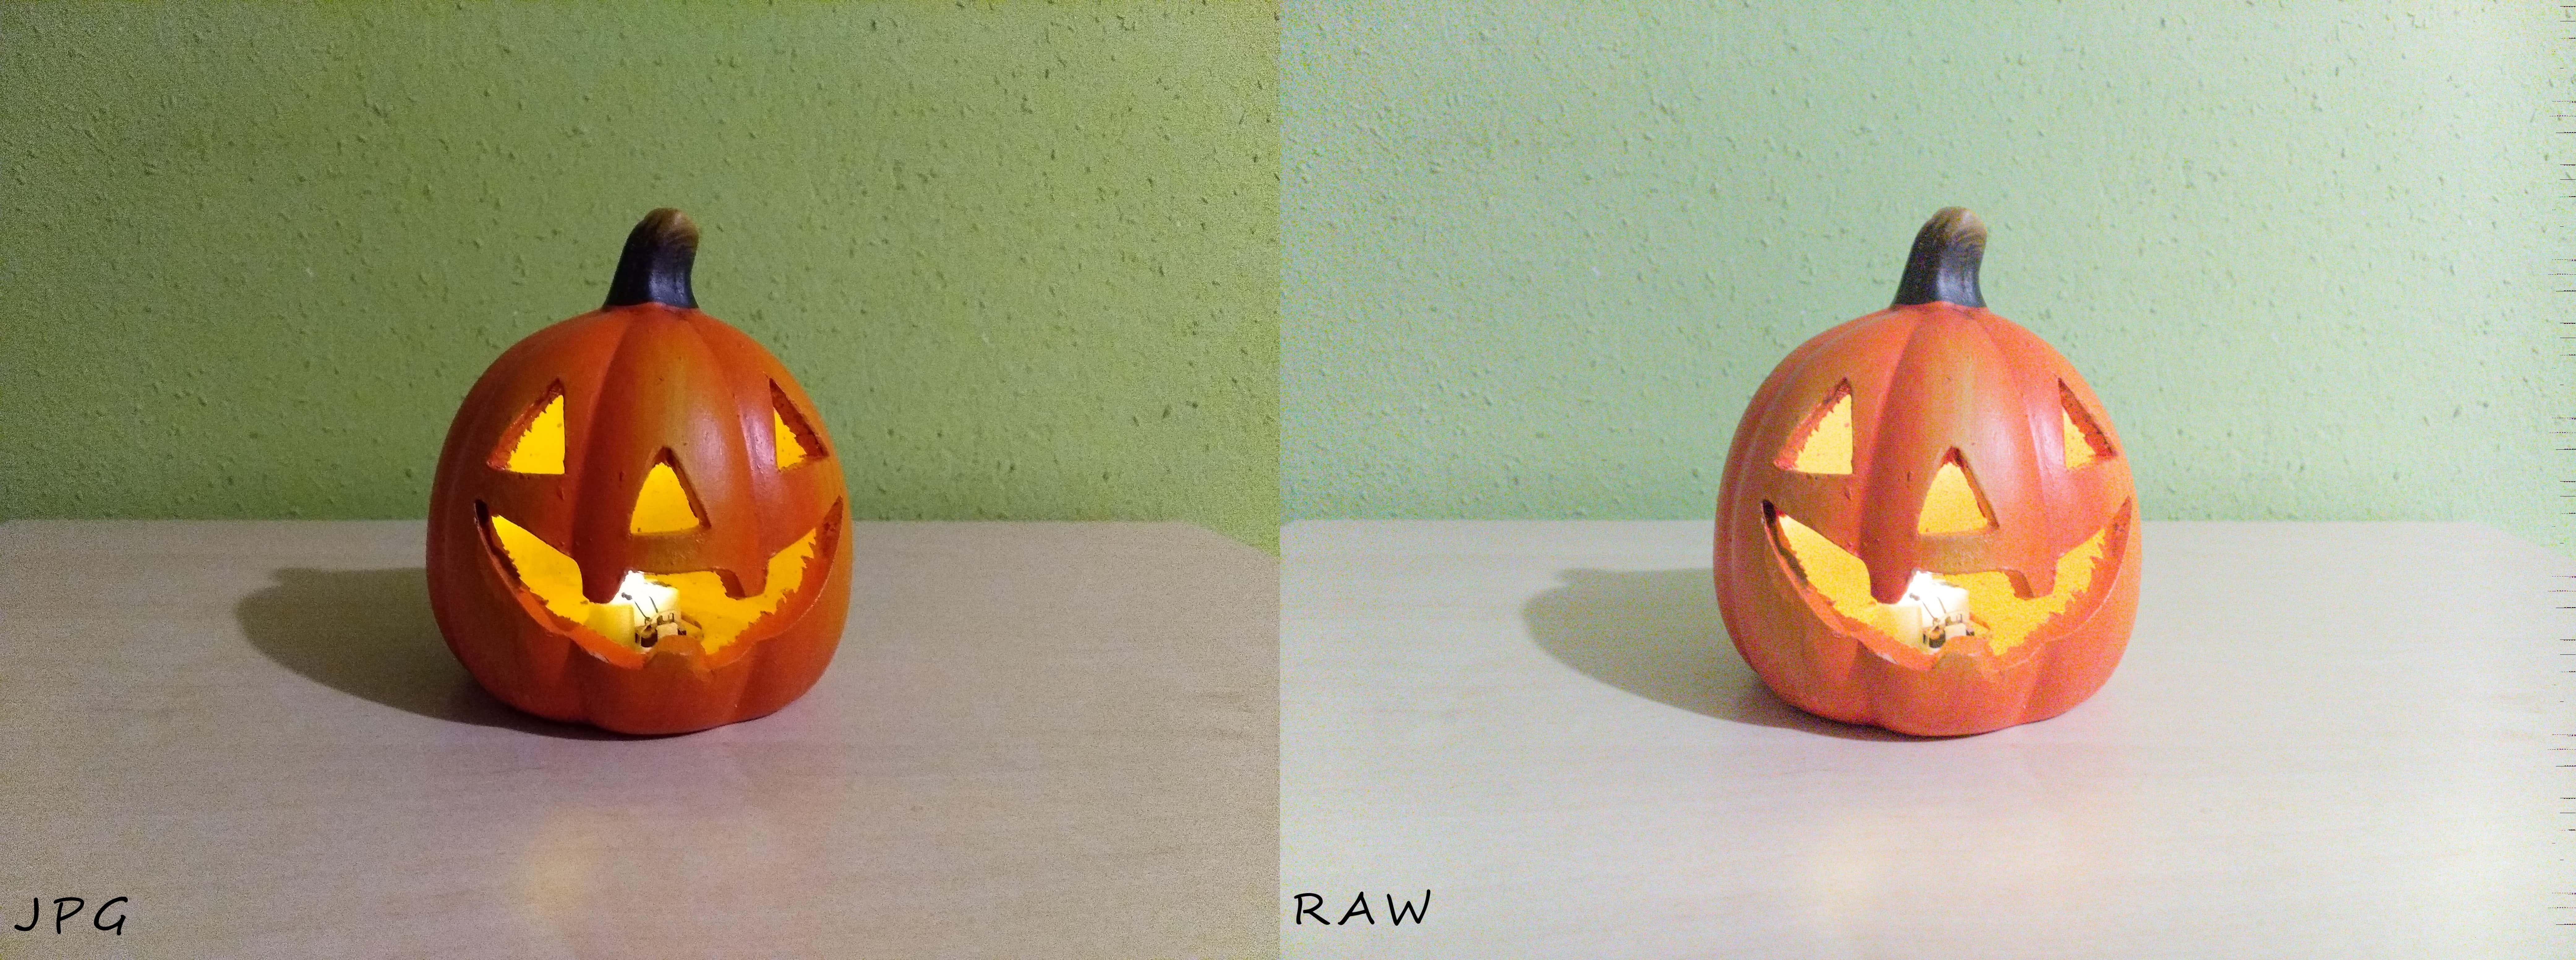 RAW vs. JPG